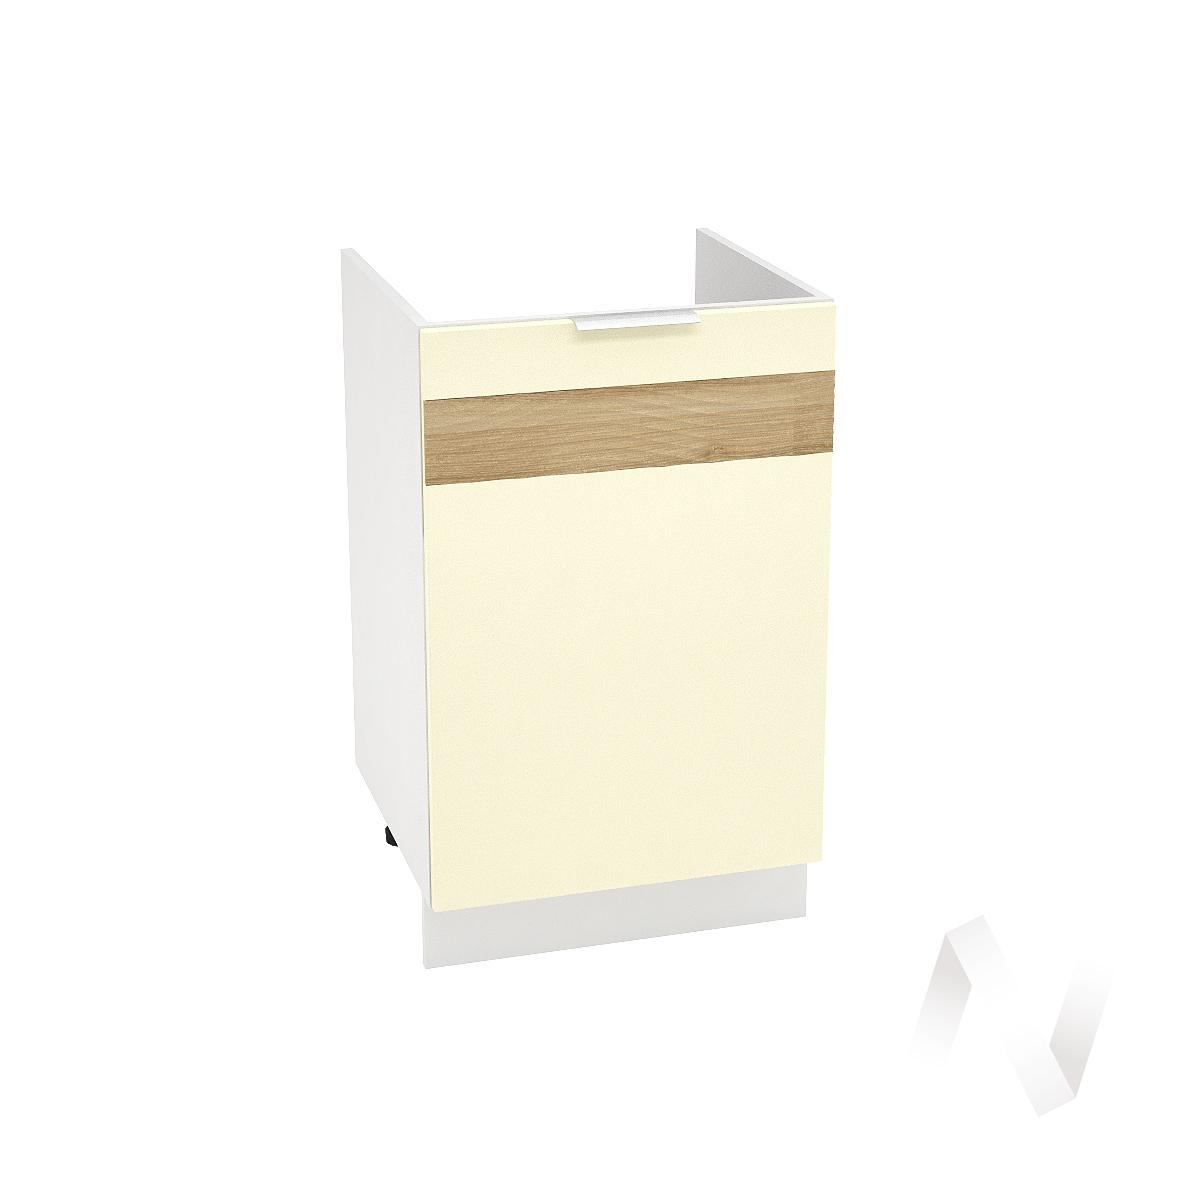 "Кухня ""Терра"": Шкаф нижний левый под мойку 500, ШНМ 500 (ваниль софт/корпус белый)"